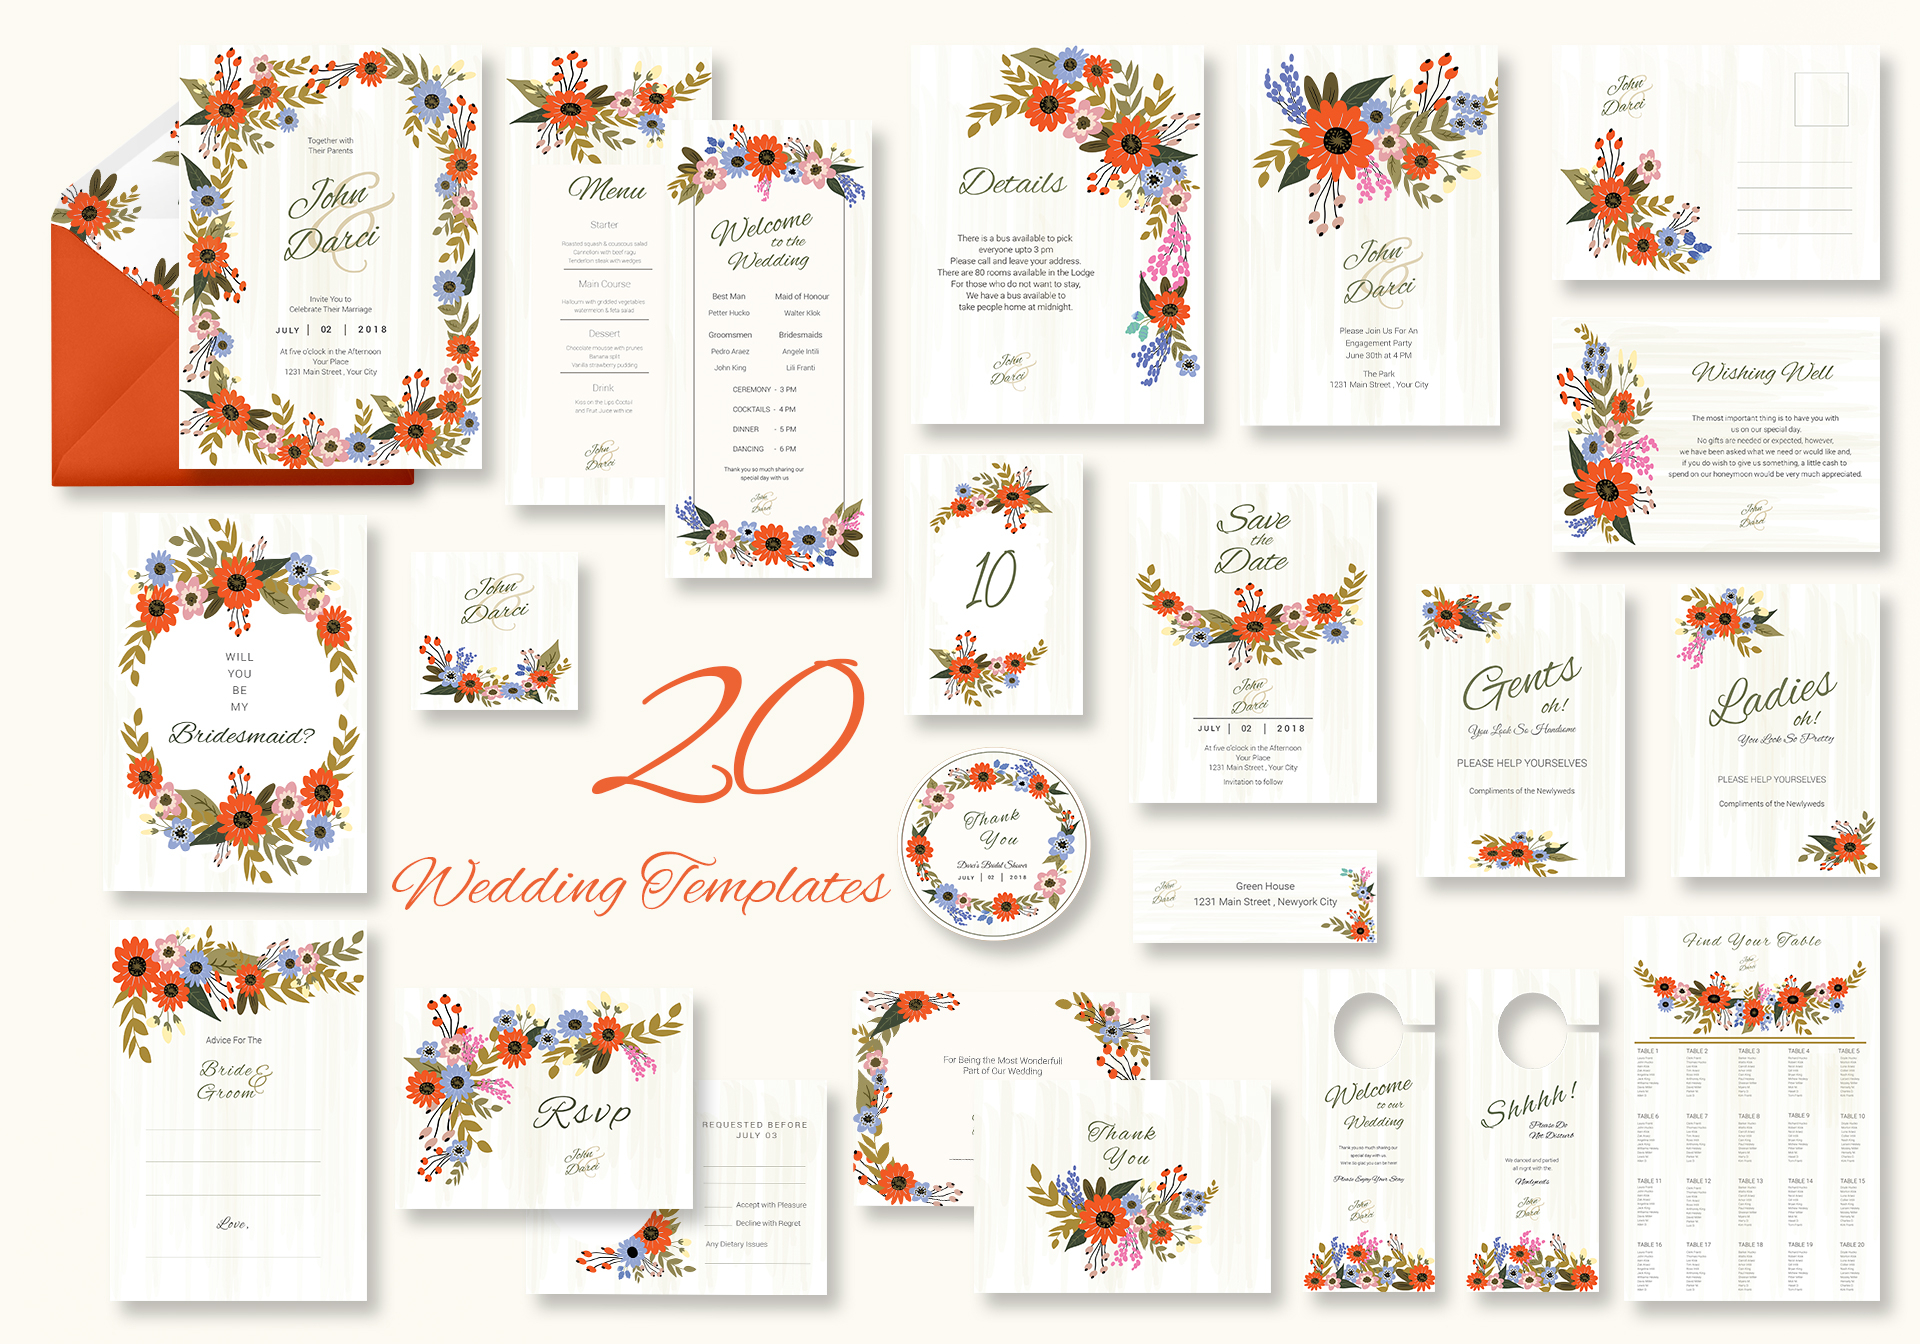 Summer Floral Wedding Templates